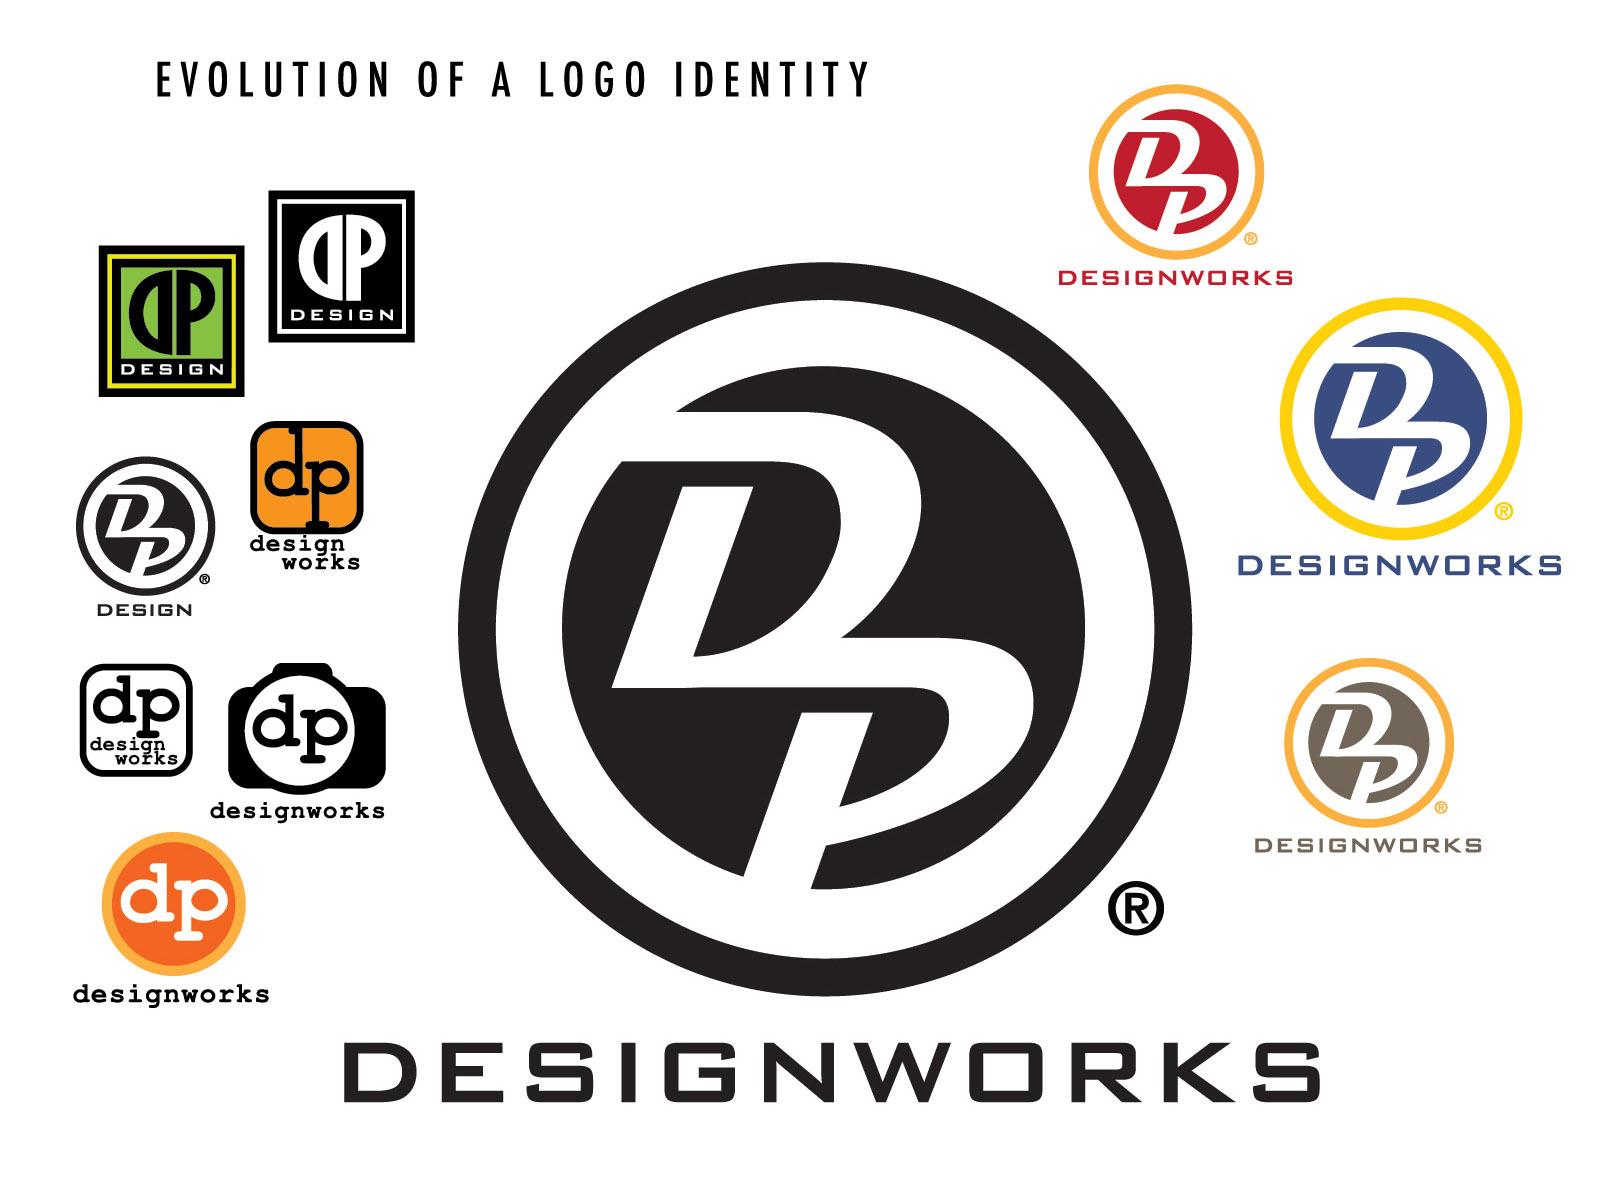 DPdesignWorks Logos